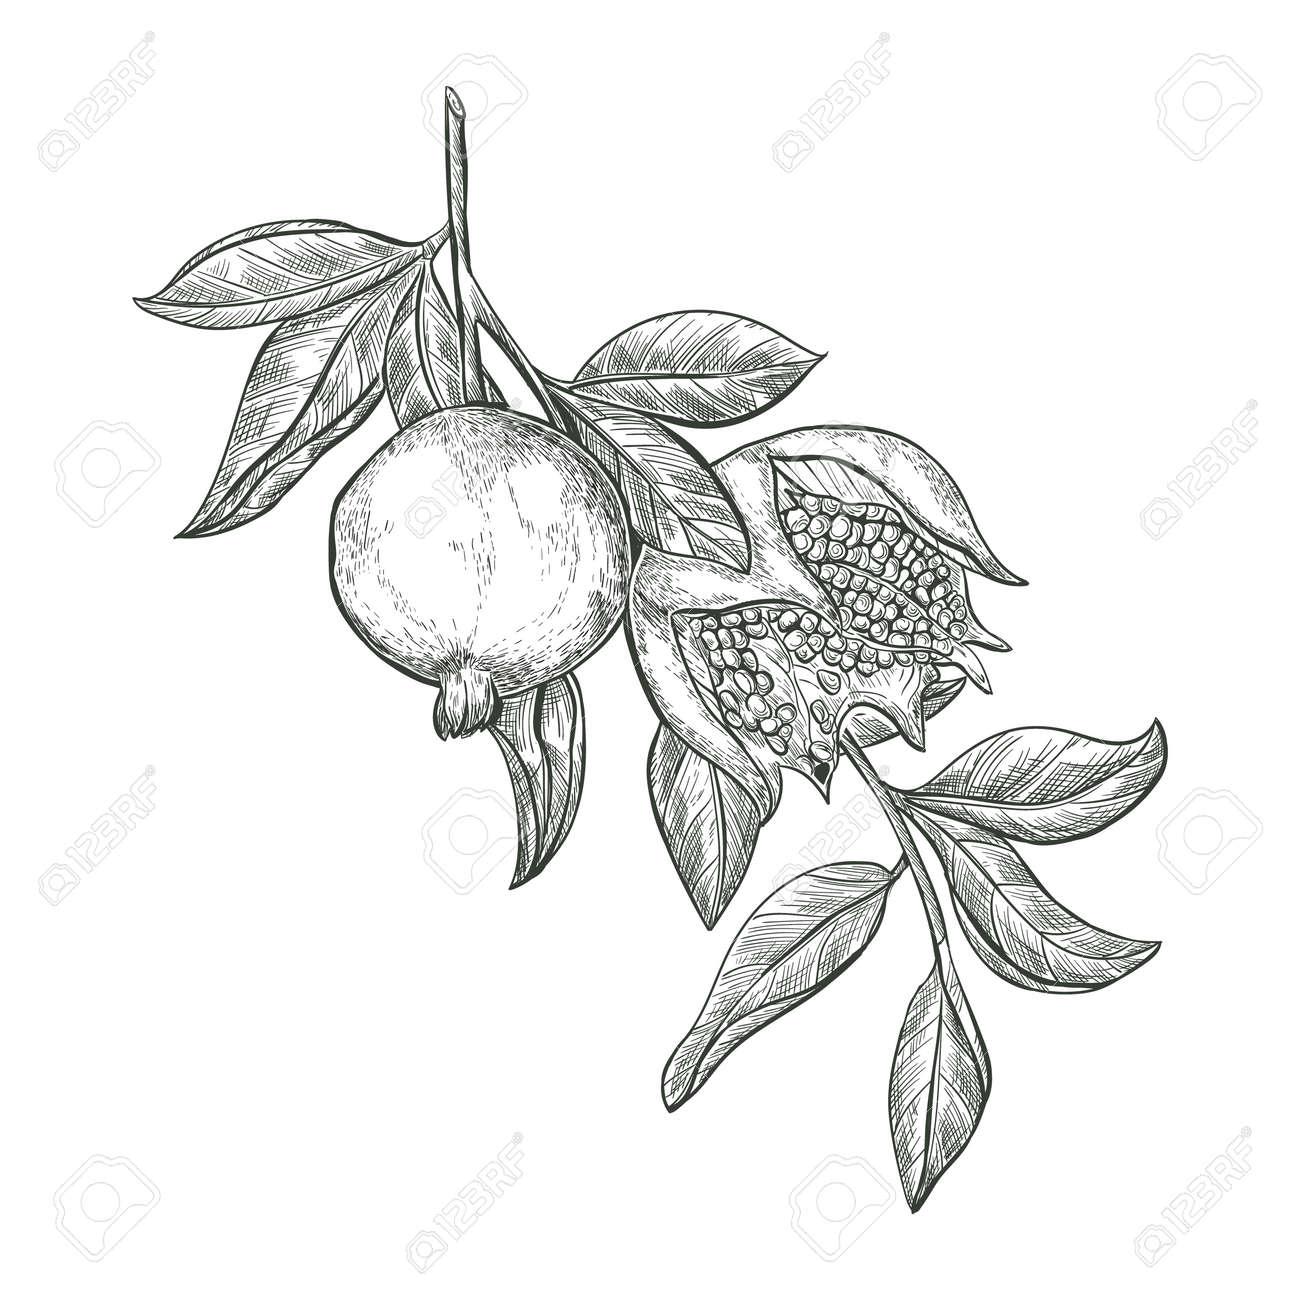 Sketch Pomegranate fruits on a branch, isolated engraved sign. Garnet ripe fruit vector sketch illustration. - 167184722